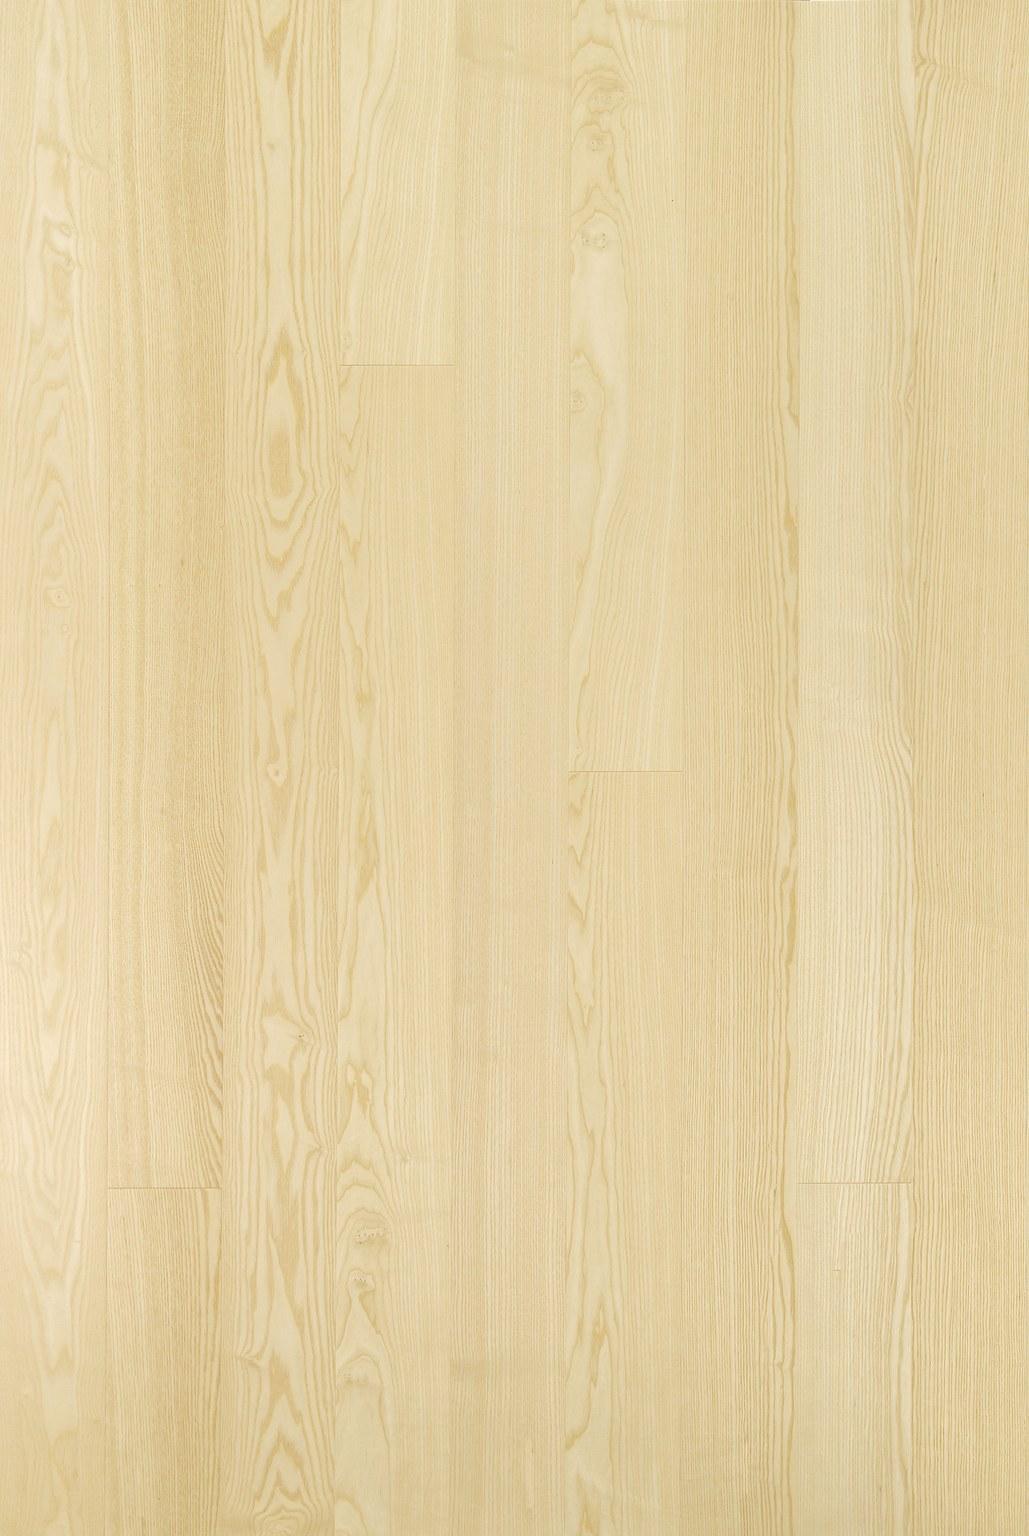 Puulattia Wooden Floor Parquet Plank Saarni Ash Select Mattalakattu Matt Lacquered 2D1